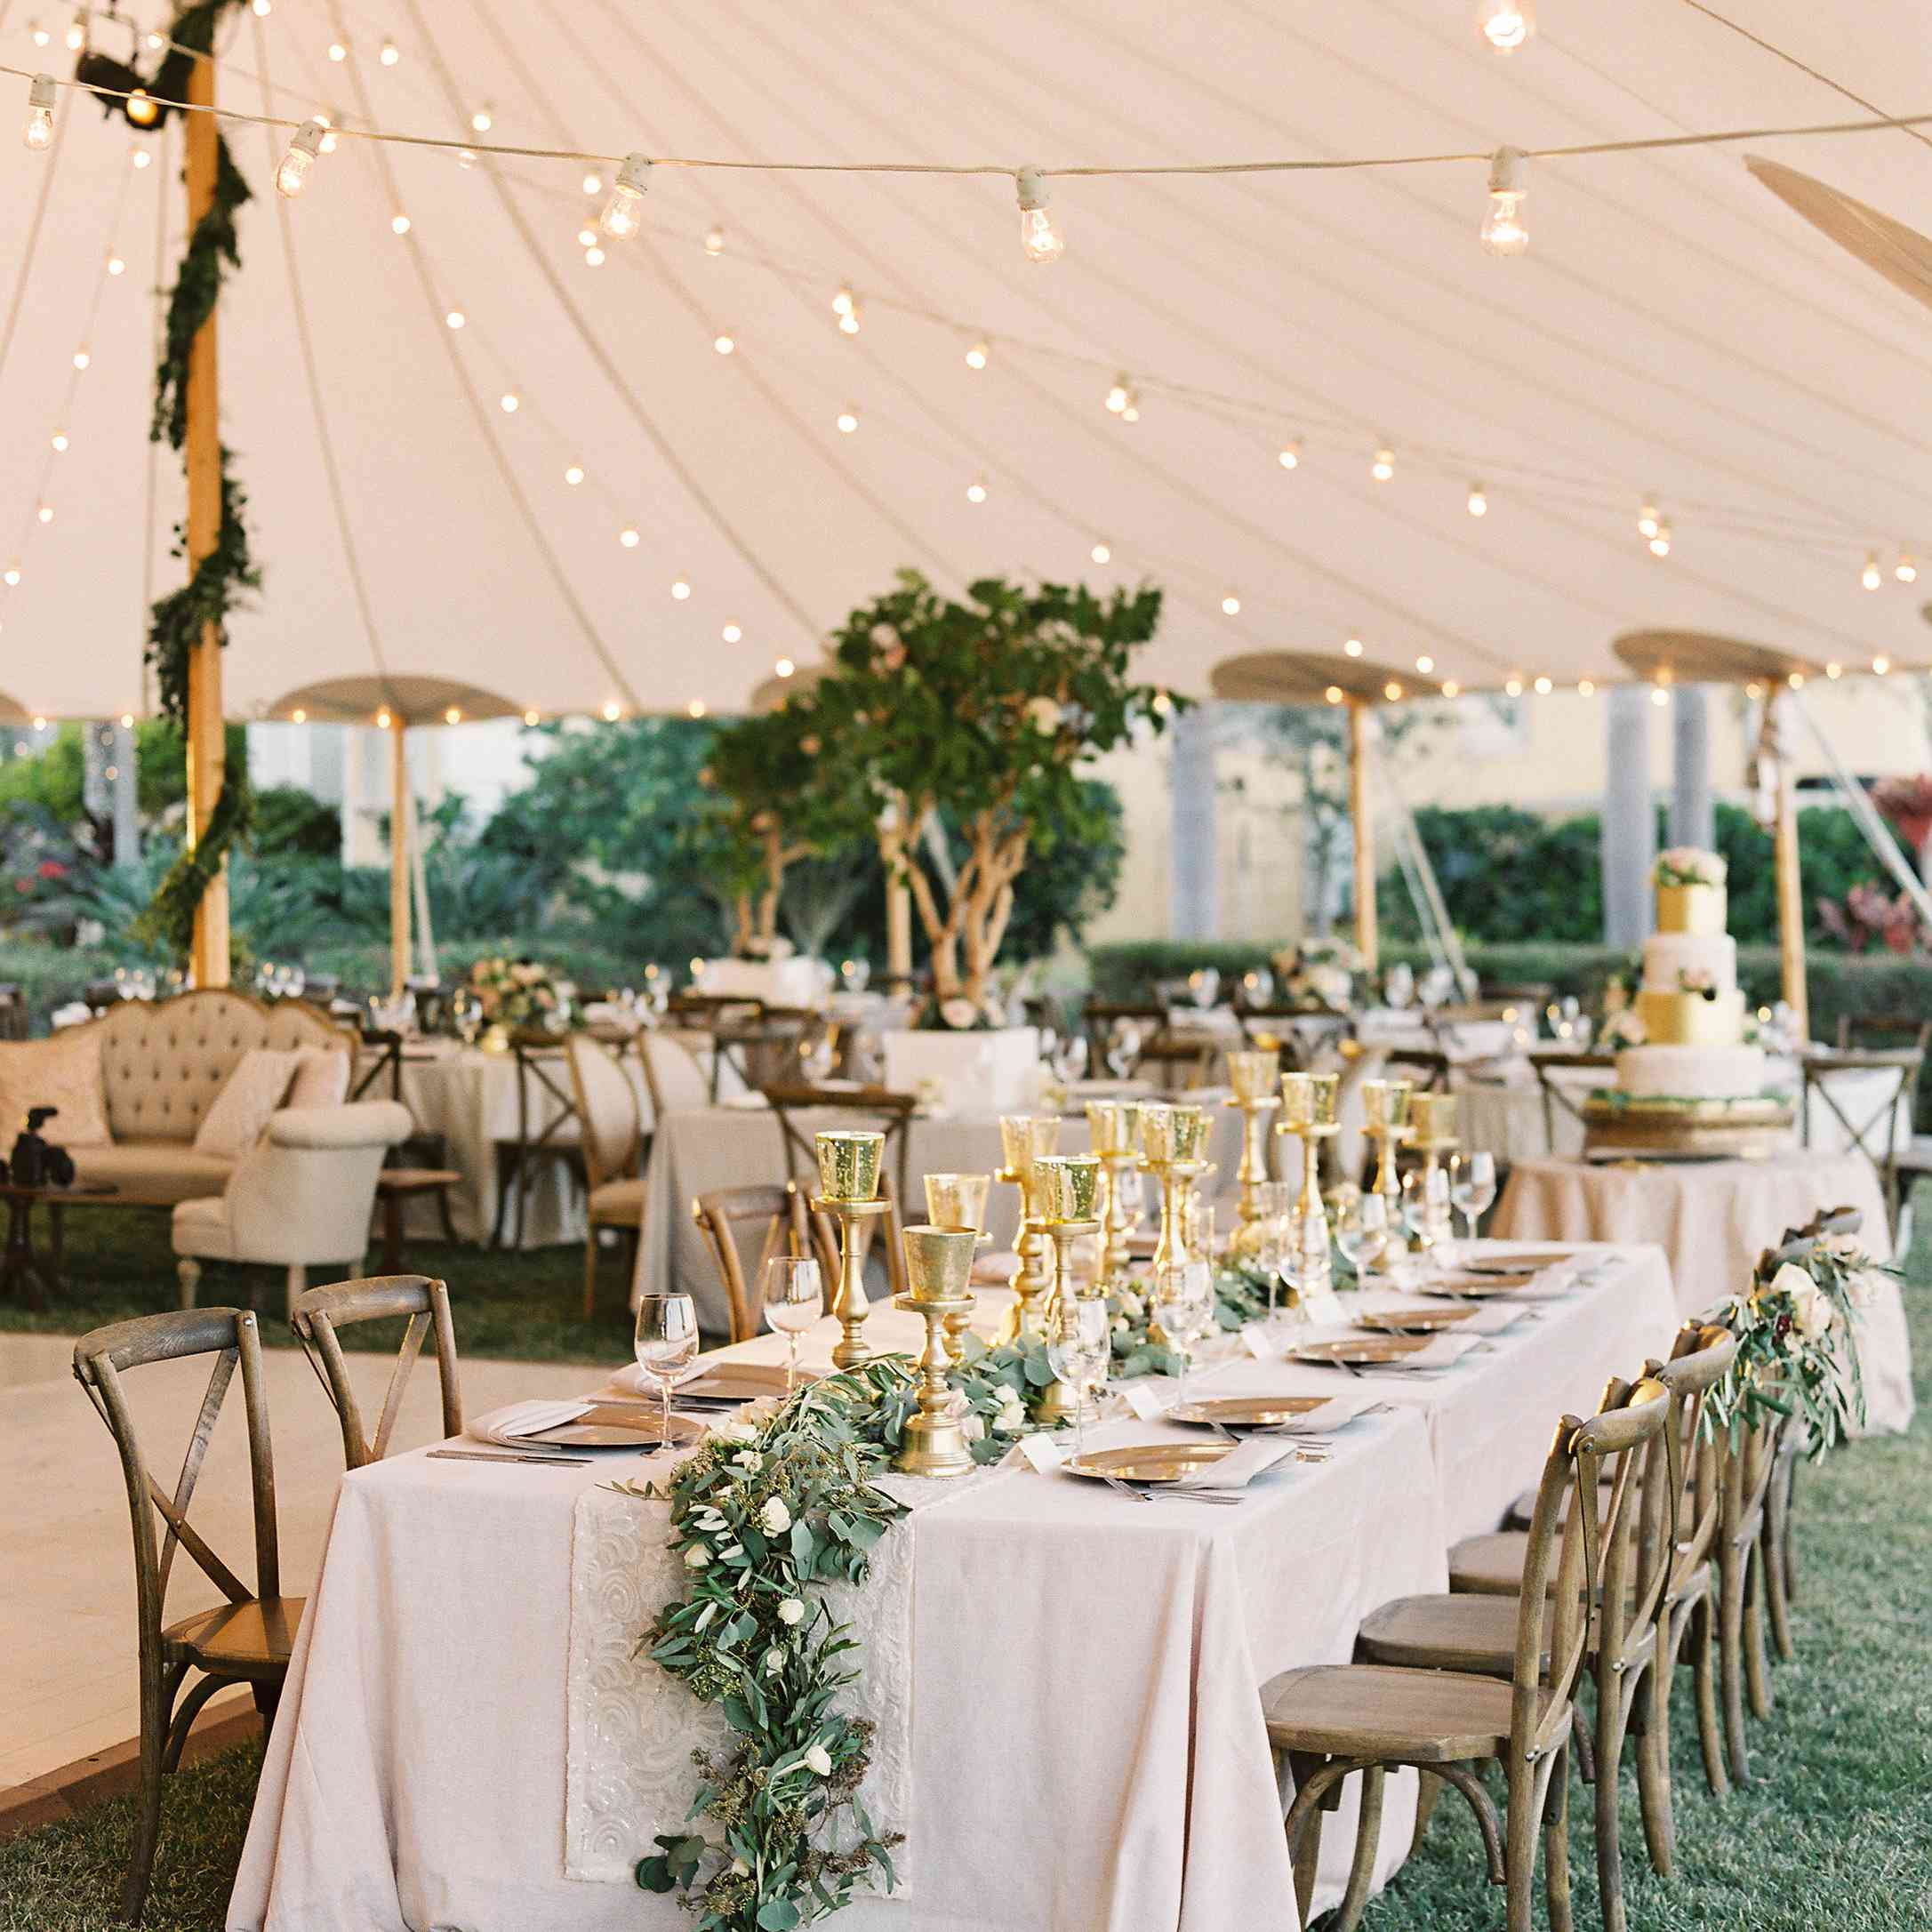 Ideas For Wedding Table Names: 18 Fall Wedding Decor Ideas For Your Head Table